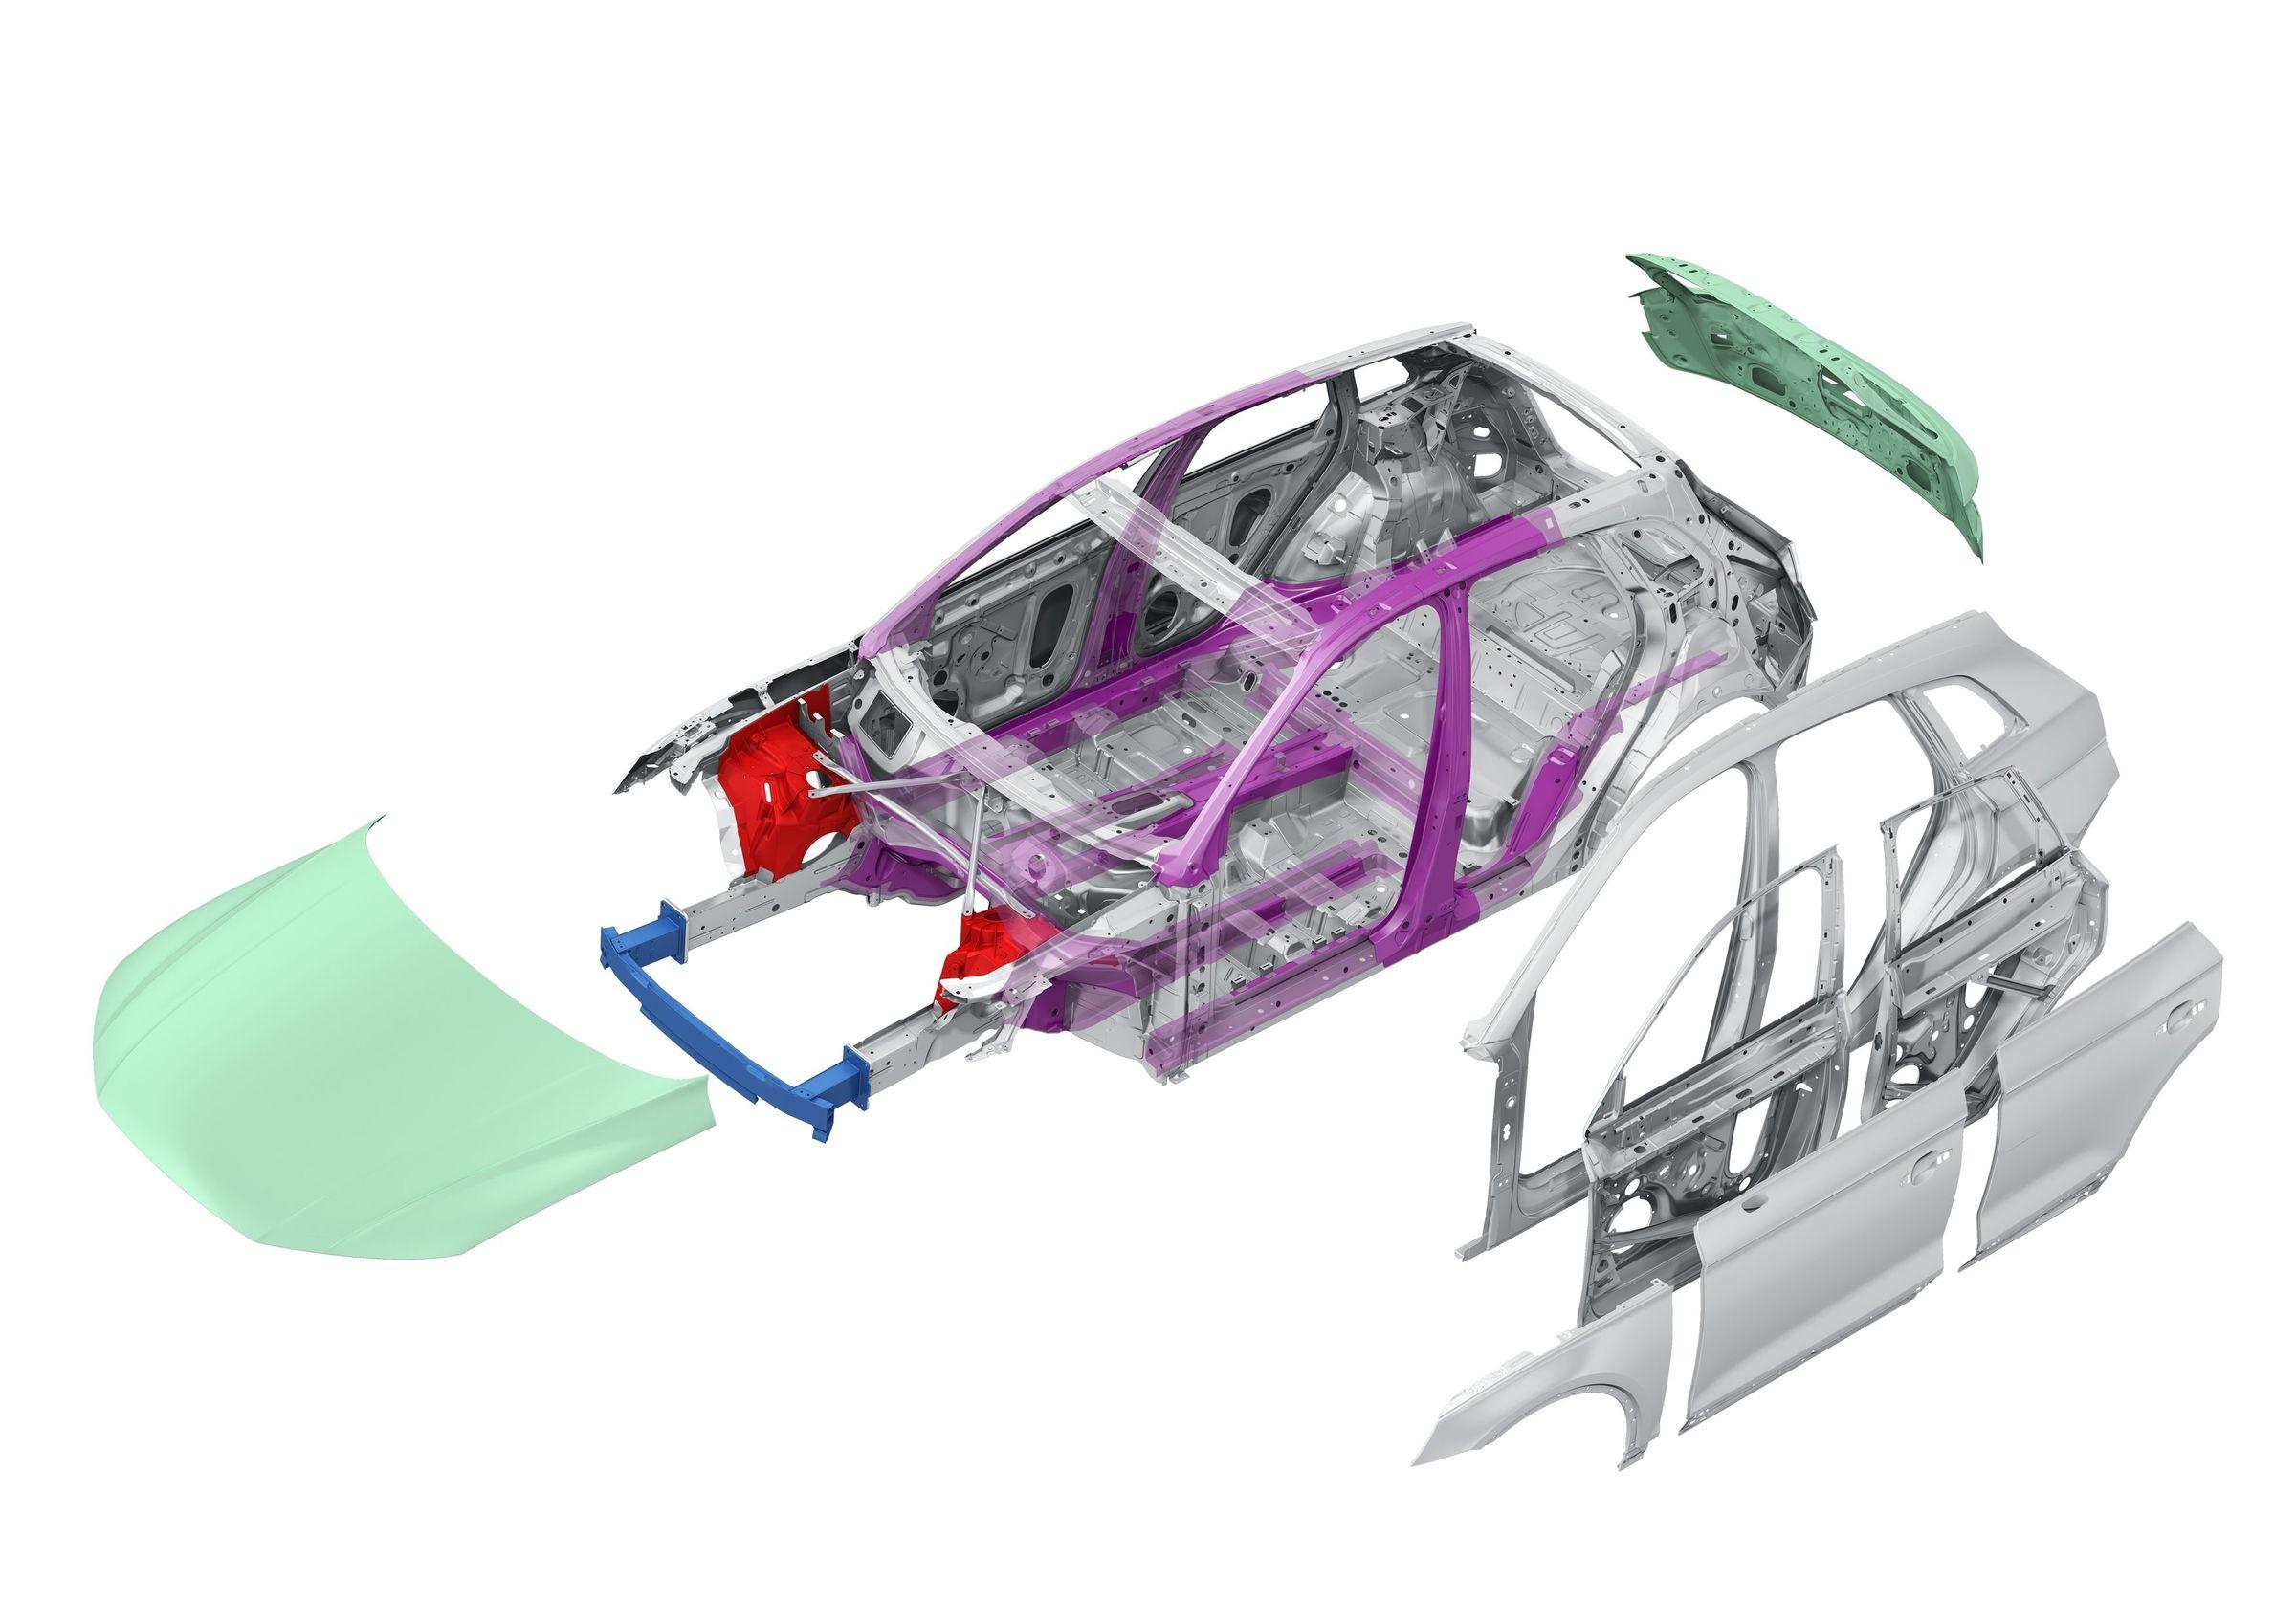 Audi Q5 Body Diagram Data Wiring Today Skateboard Parts Technology Portal Mediacenter